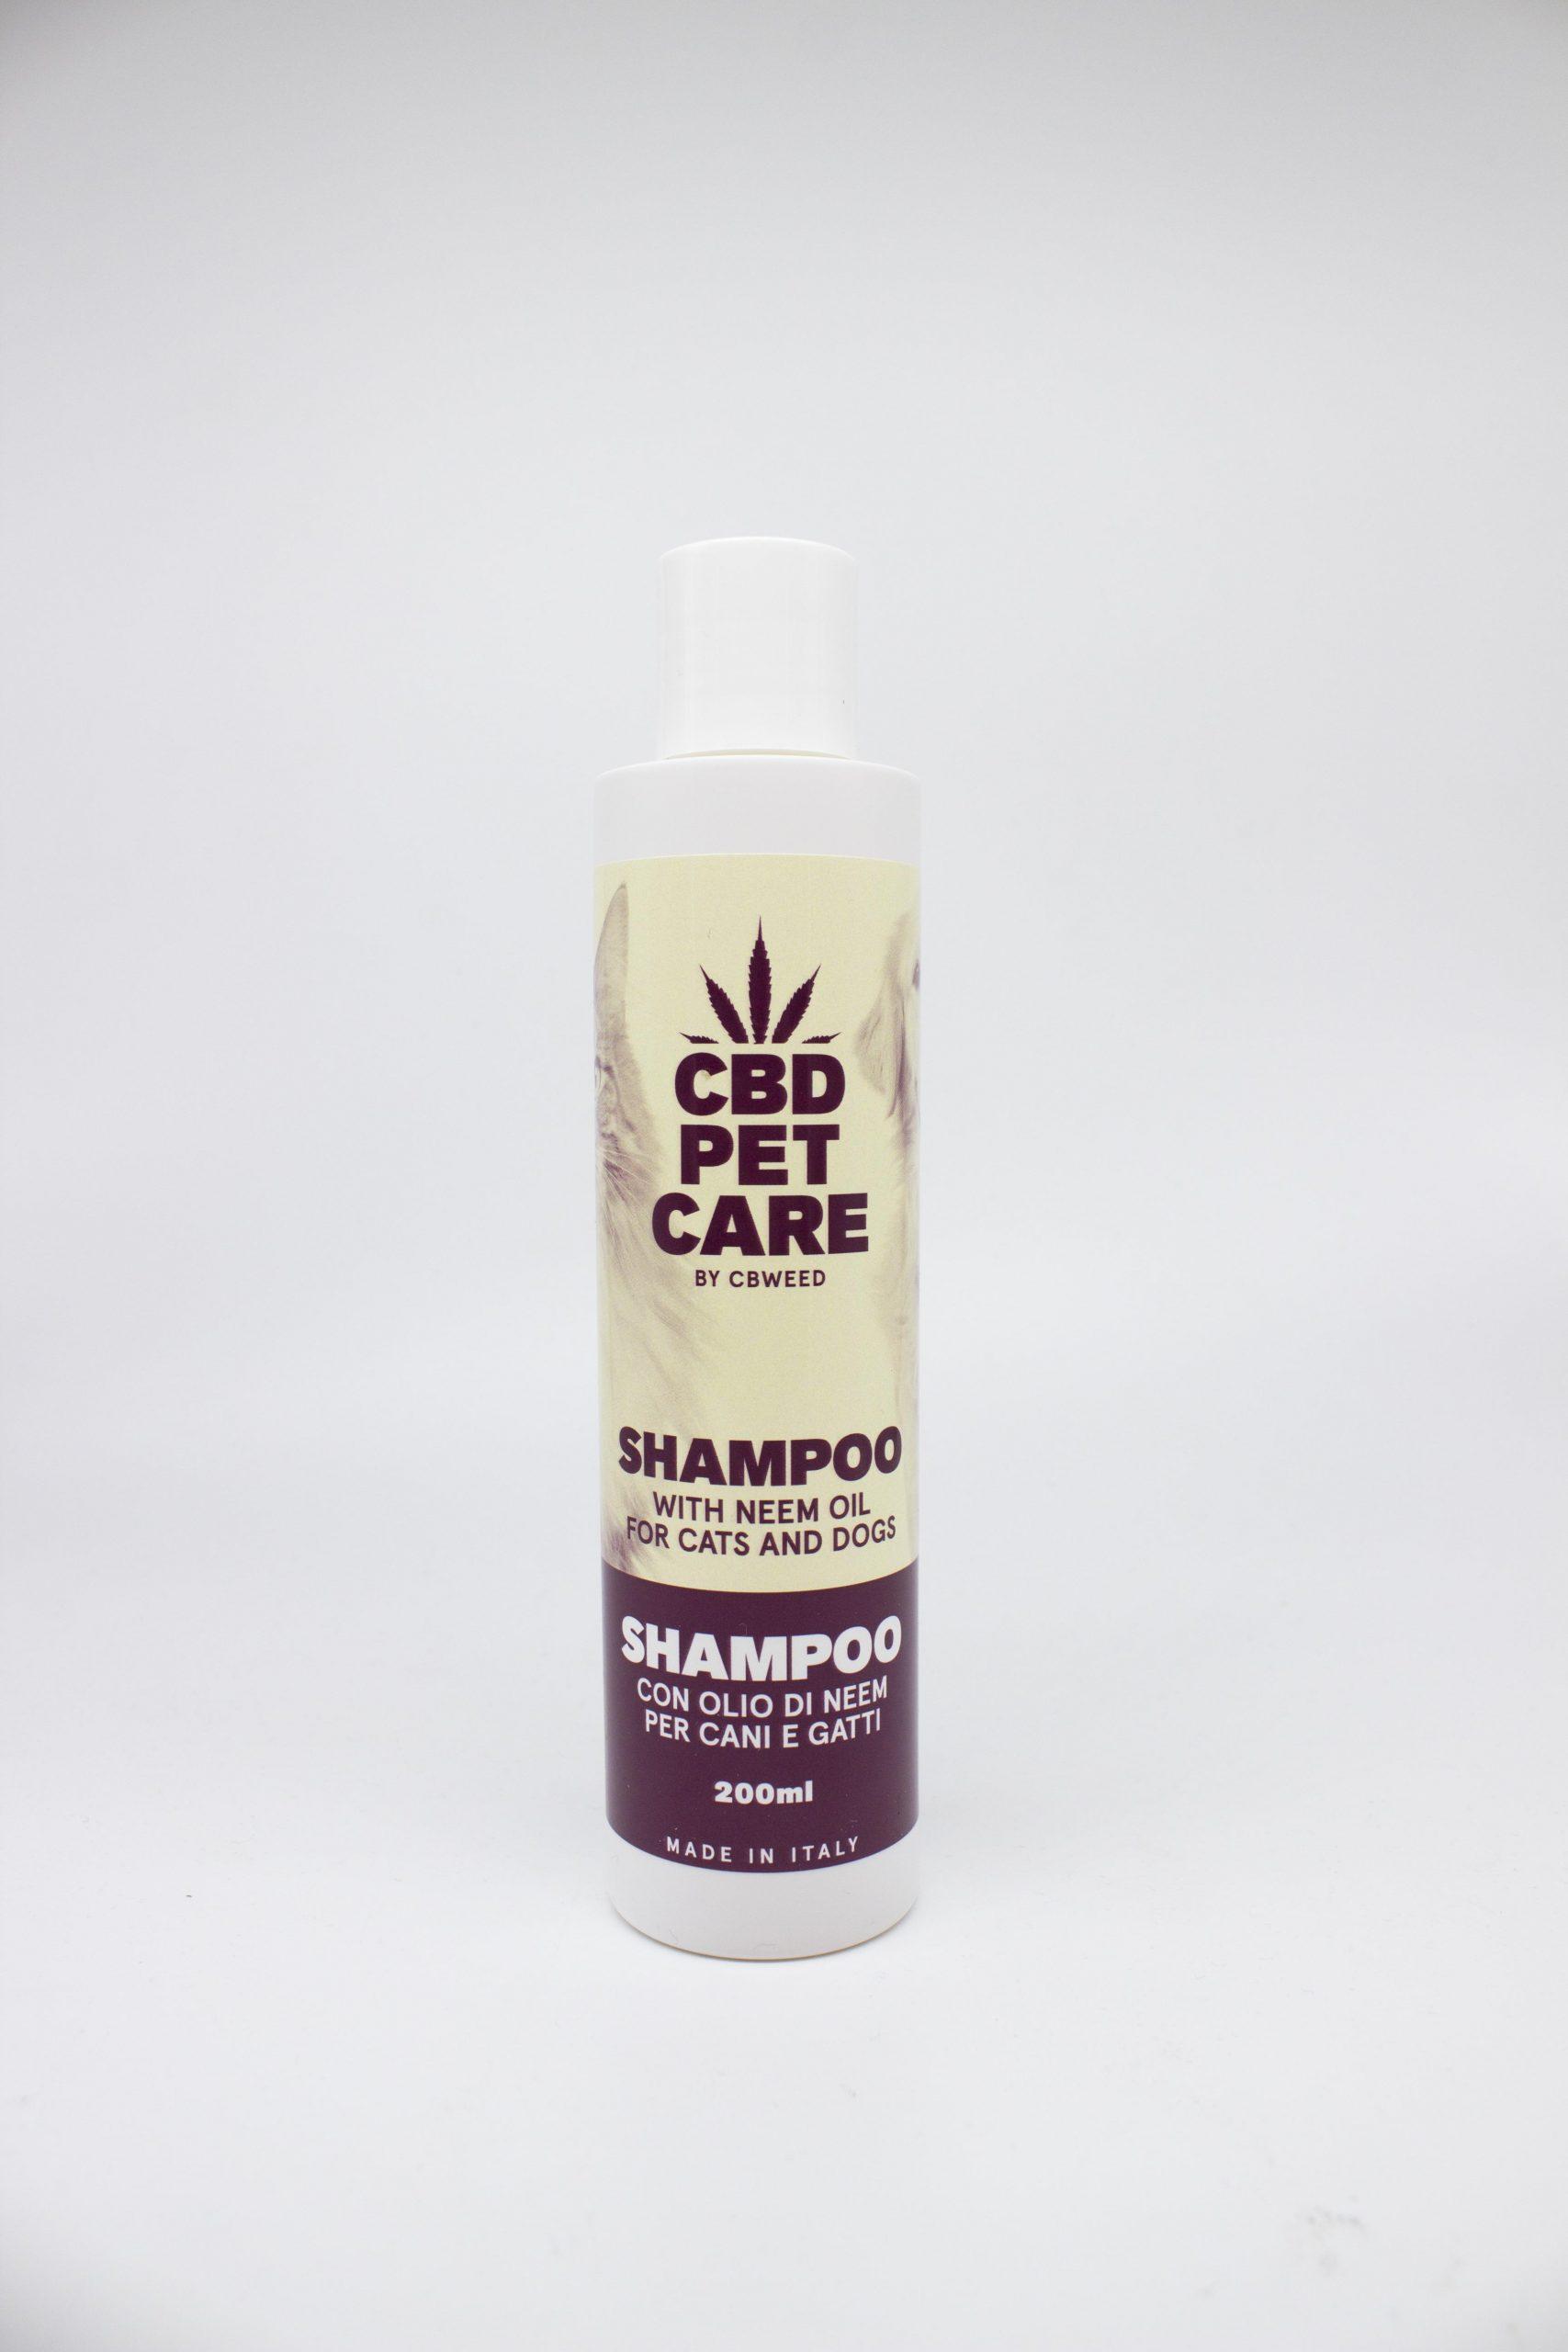 Shampoo CaniGatti 01 WEB scaled - Shampoo Cani & Gatti - 200ml